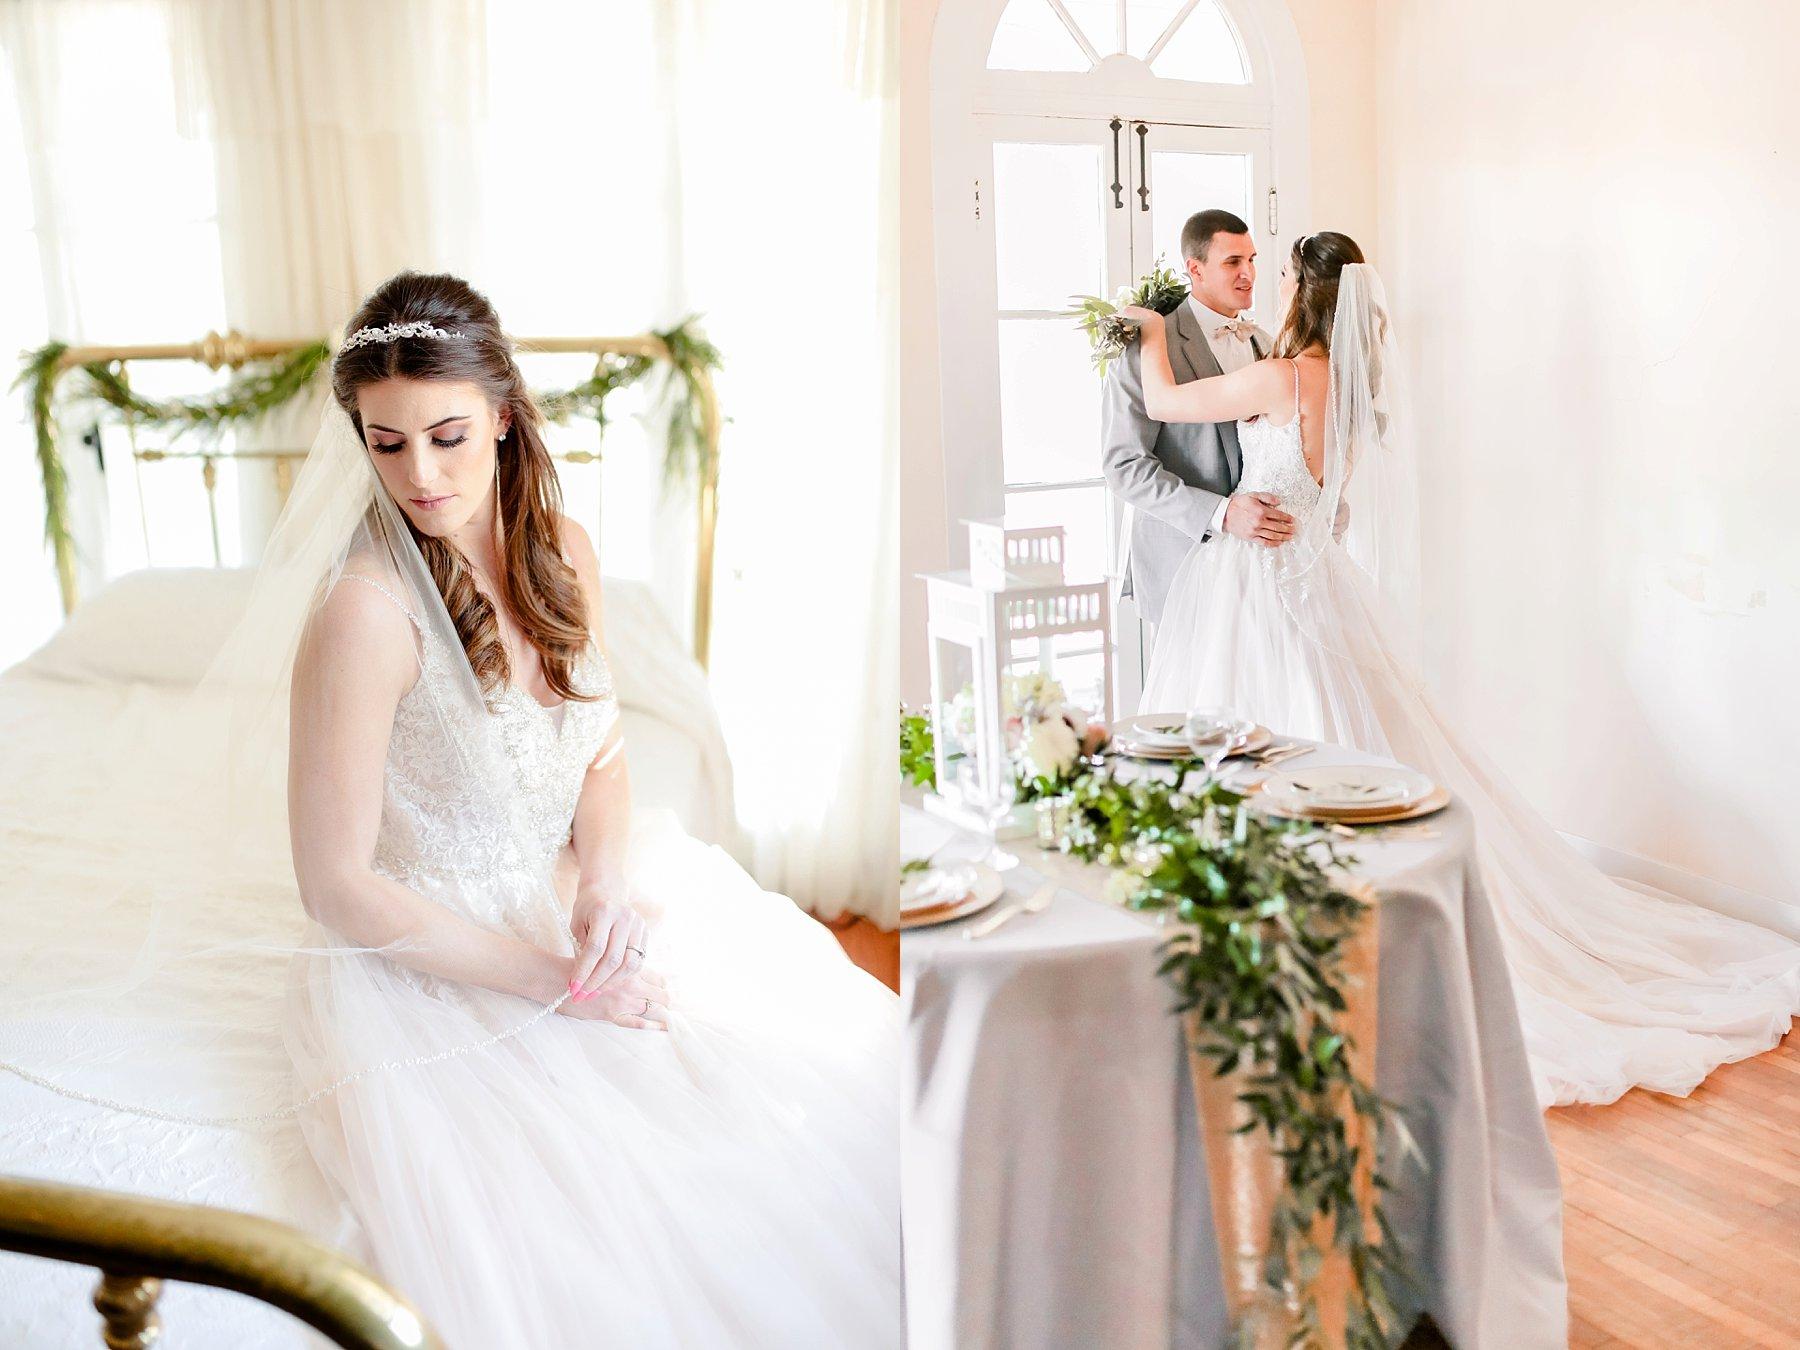 photographer_wedding_saint_louis_Kansas_City_Photography_Videography_workshop_training_styled_engagement_Lake_Ozark_KC_MO_STL_Rolla_Hermann_Saint_James_0436.jpg